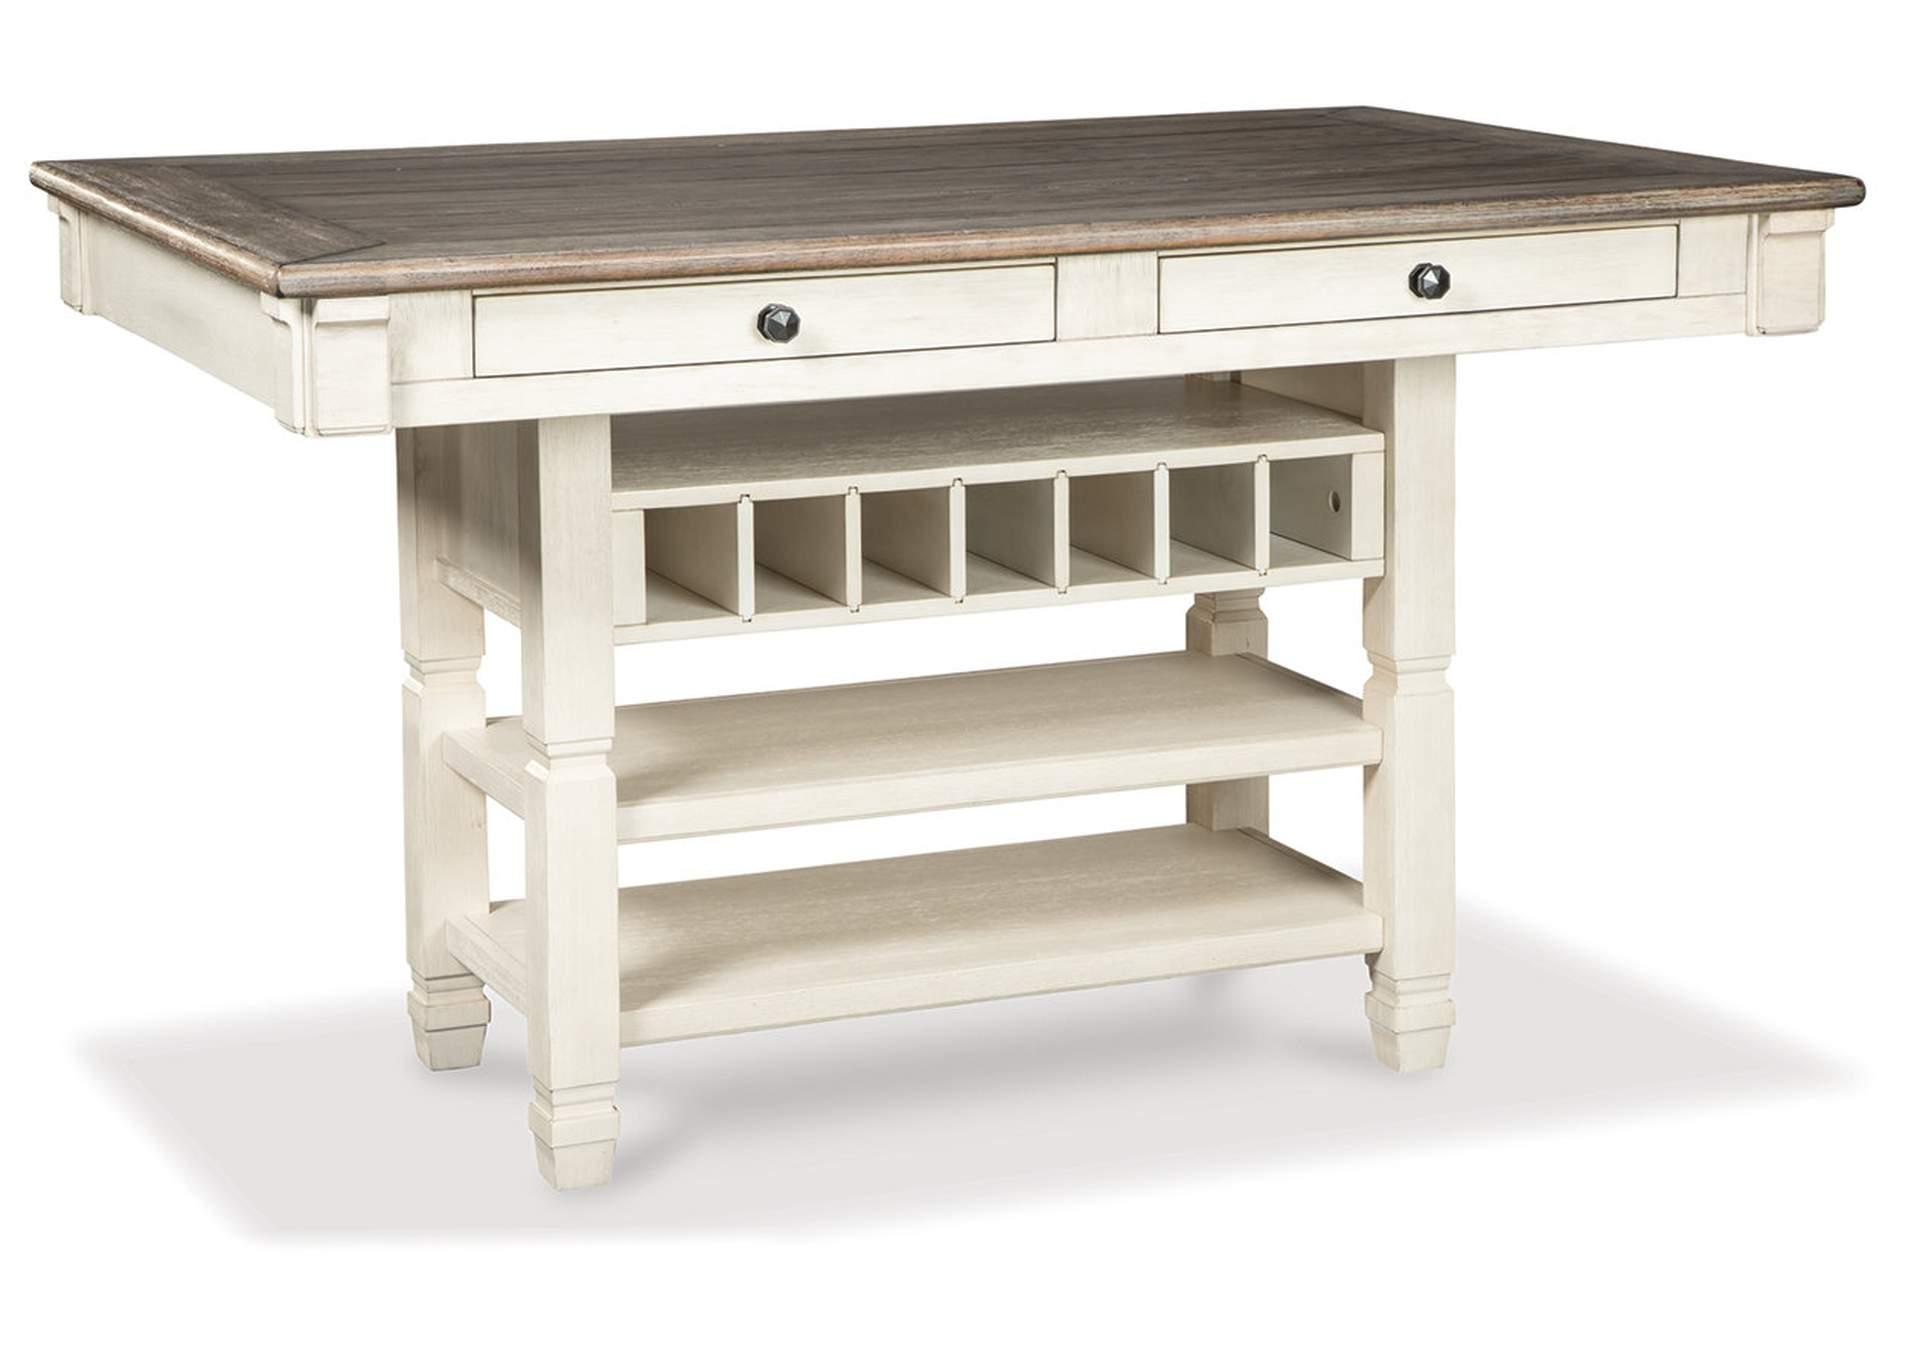 Bolanburg Rectangular Counter Height Table